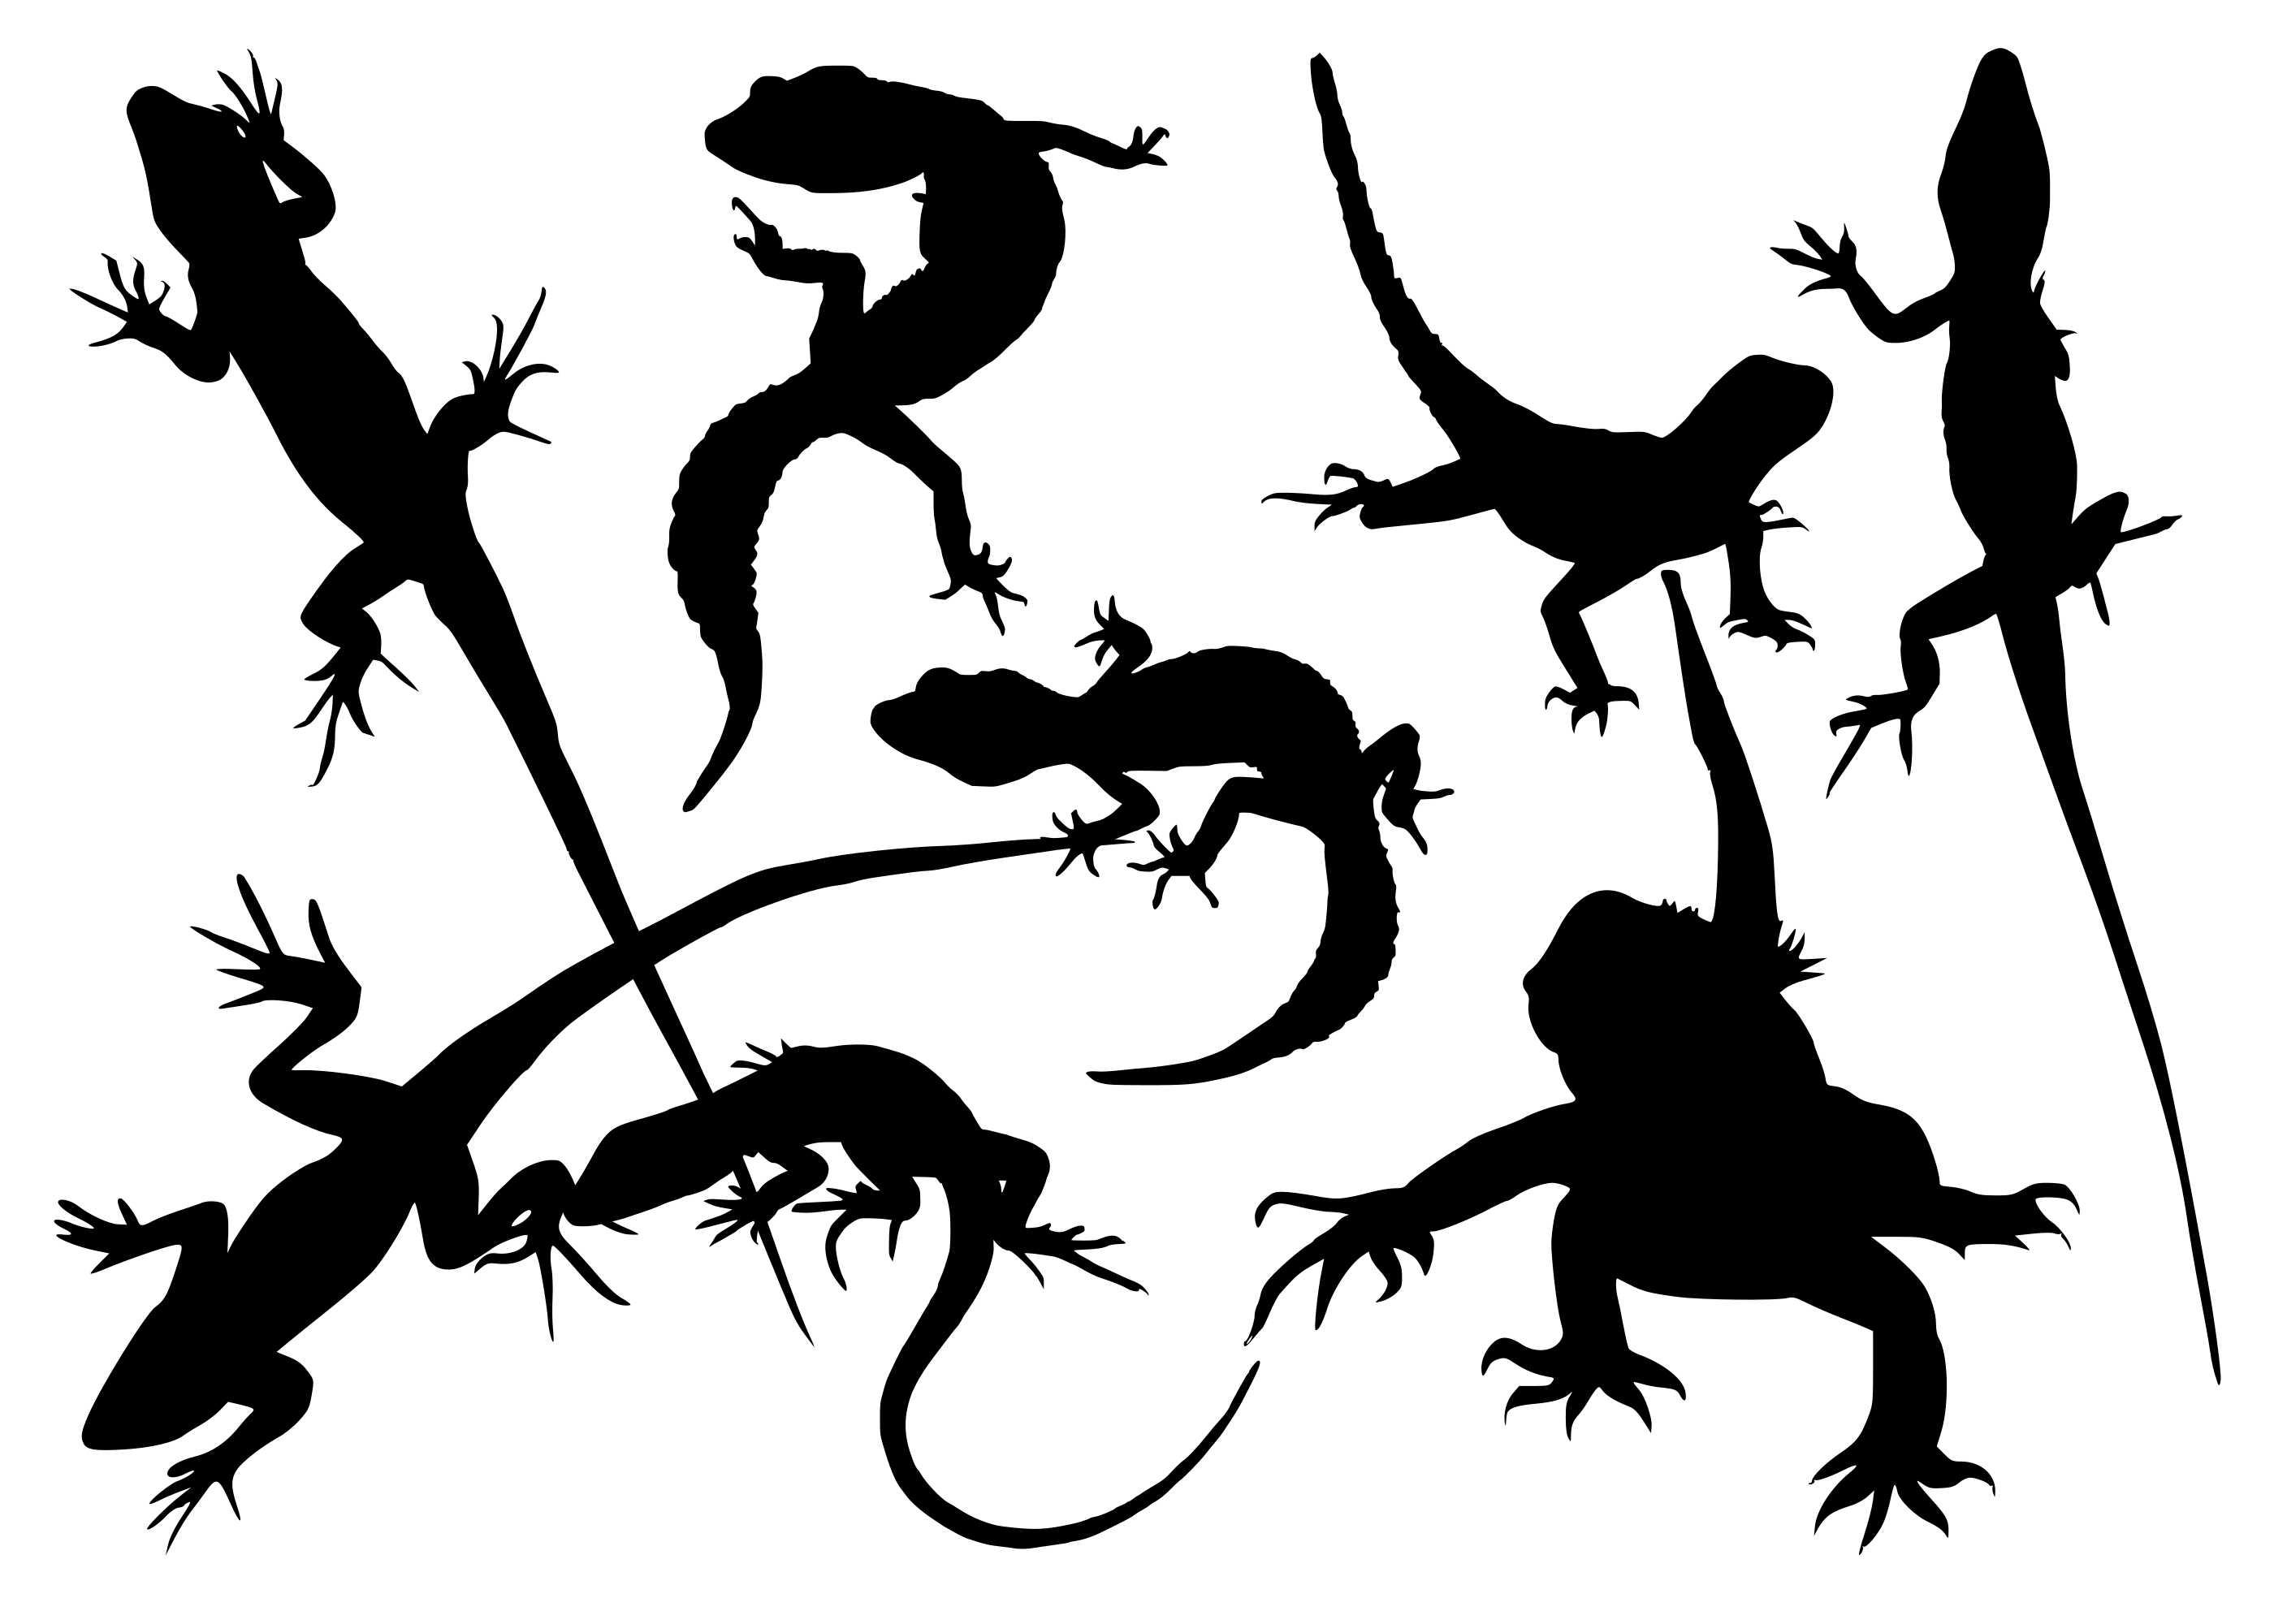 8-lizard-silhouette-cover.jpg